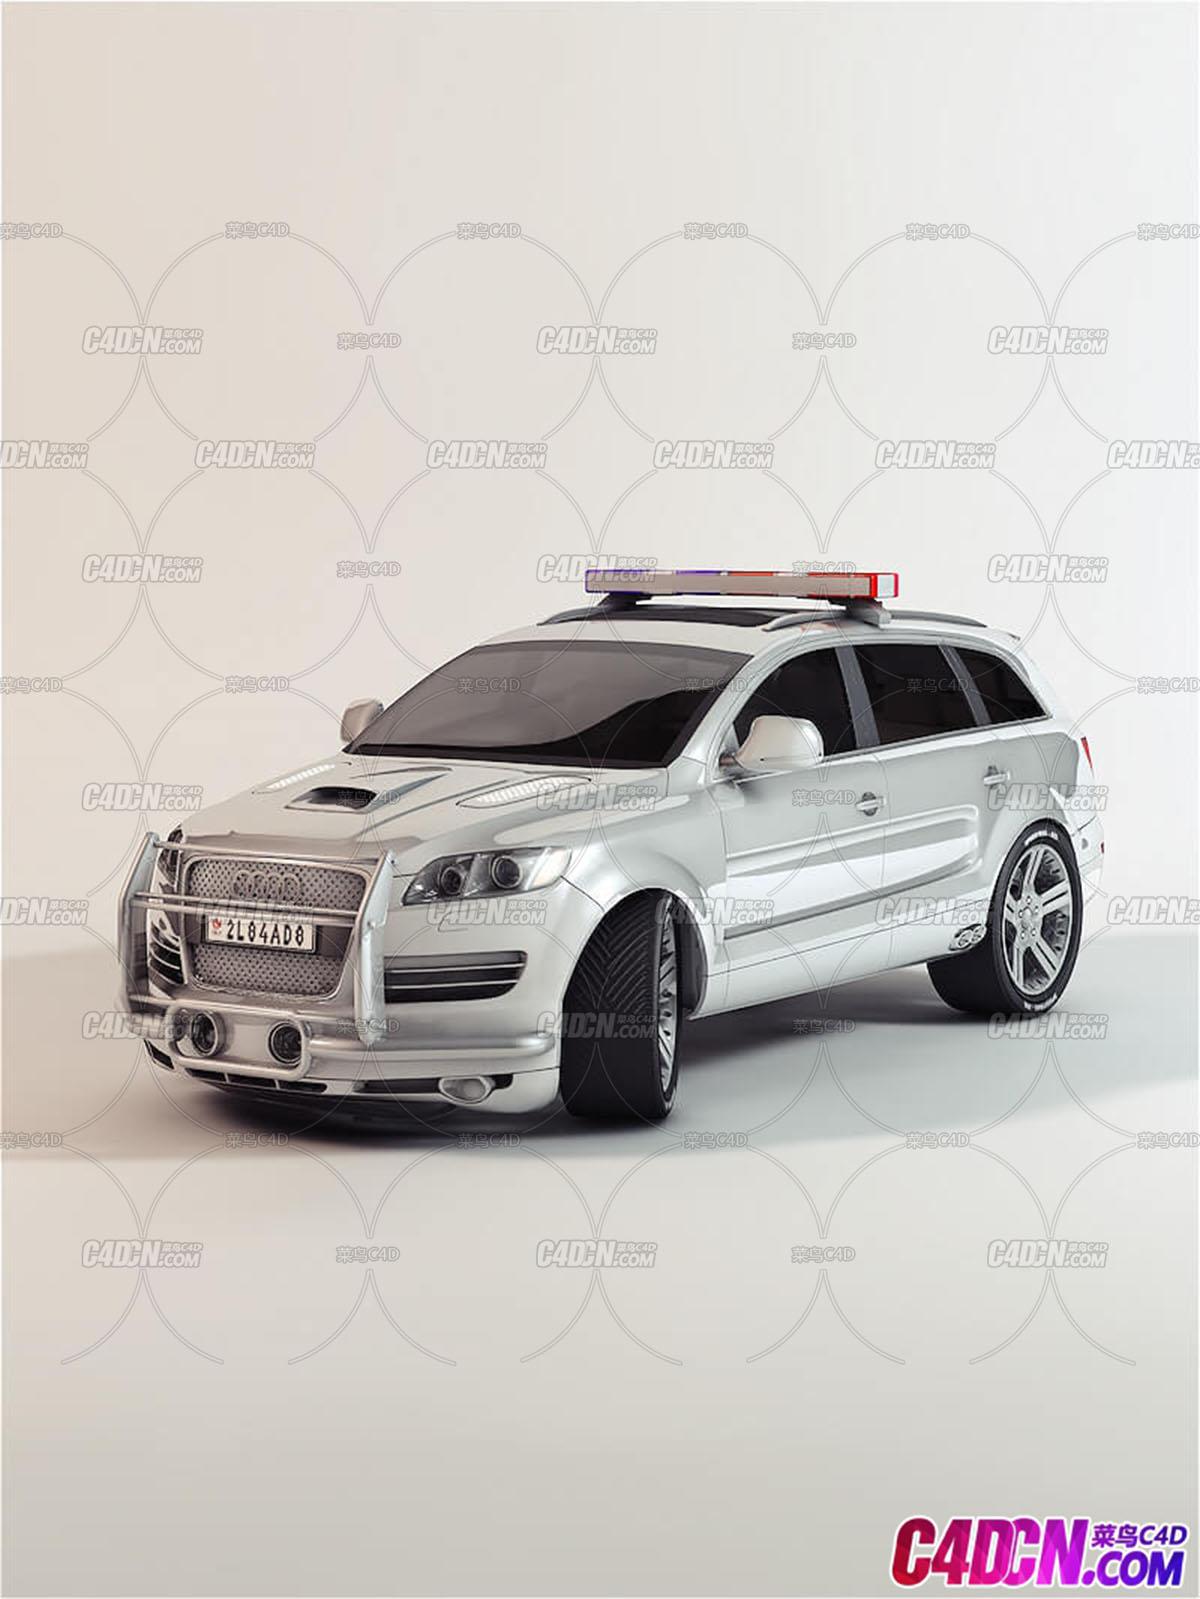 C4D模型 Octane渲染器奥迪SUV汽车模型改装交通模型